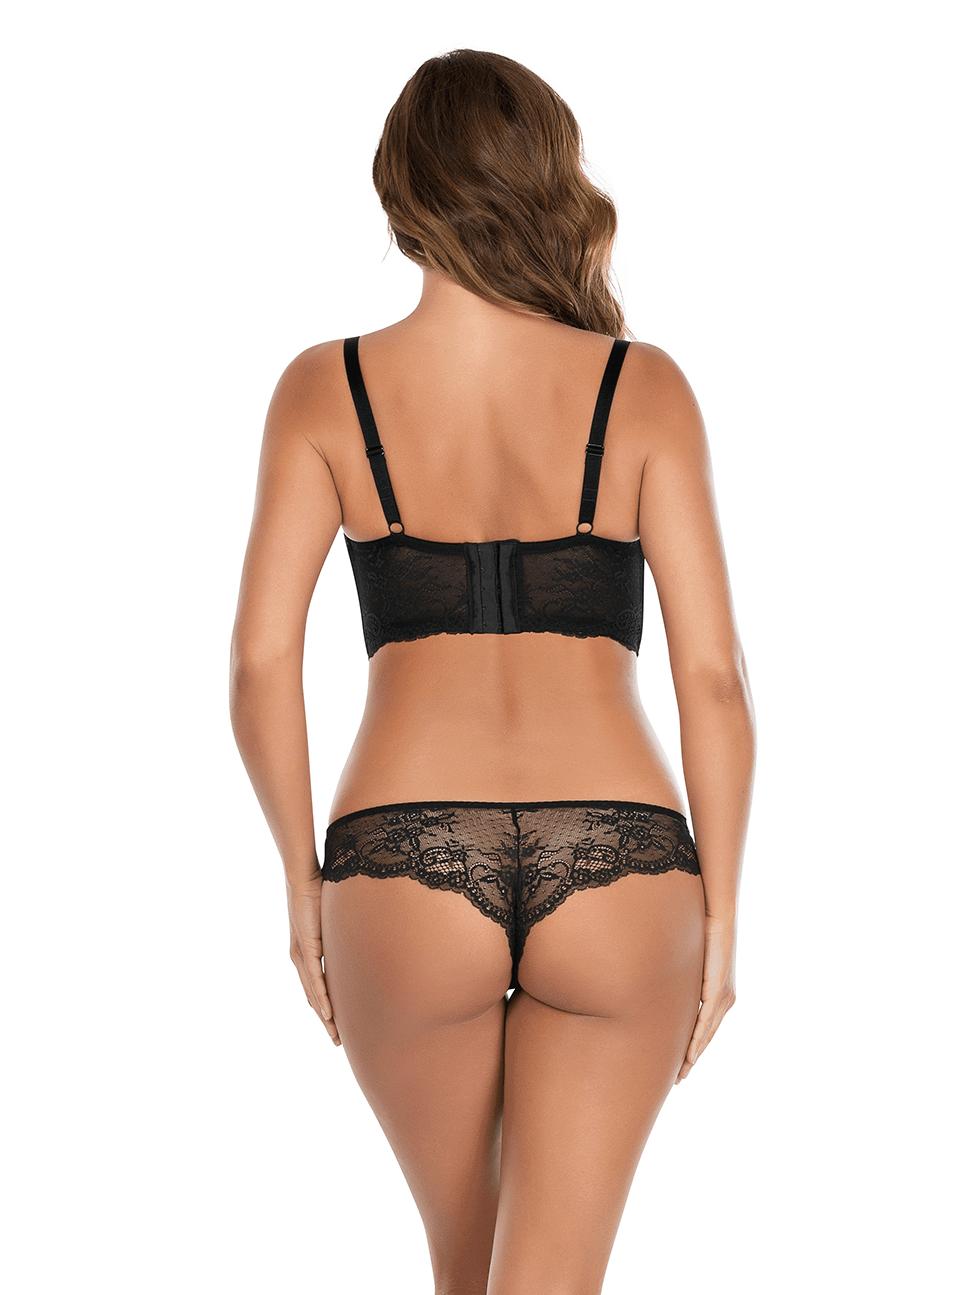 Sandrine PlungeLonglineBraP5351 BrazilianThongP5354 Black Back - Sandrine Longline Bra Black P5351